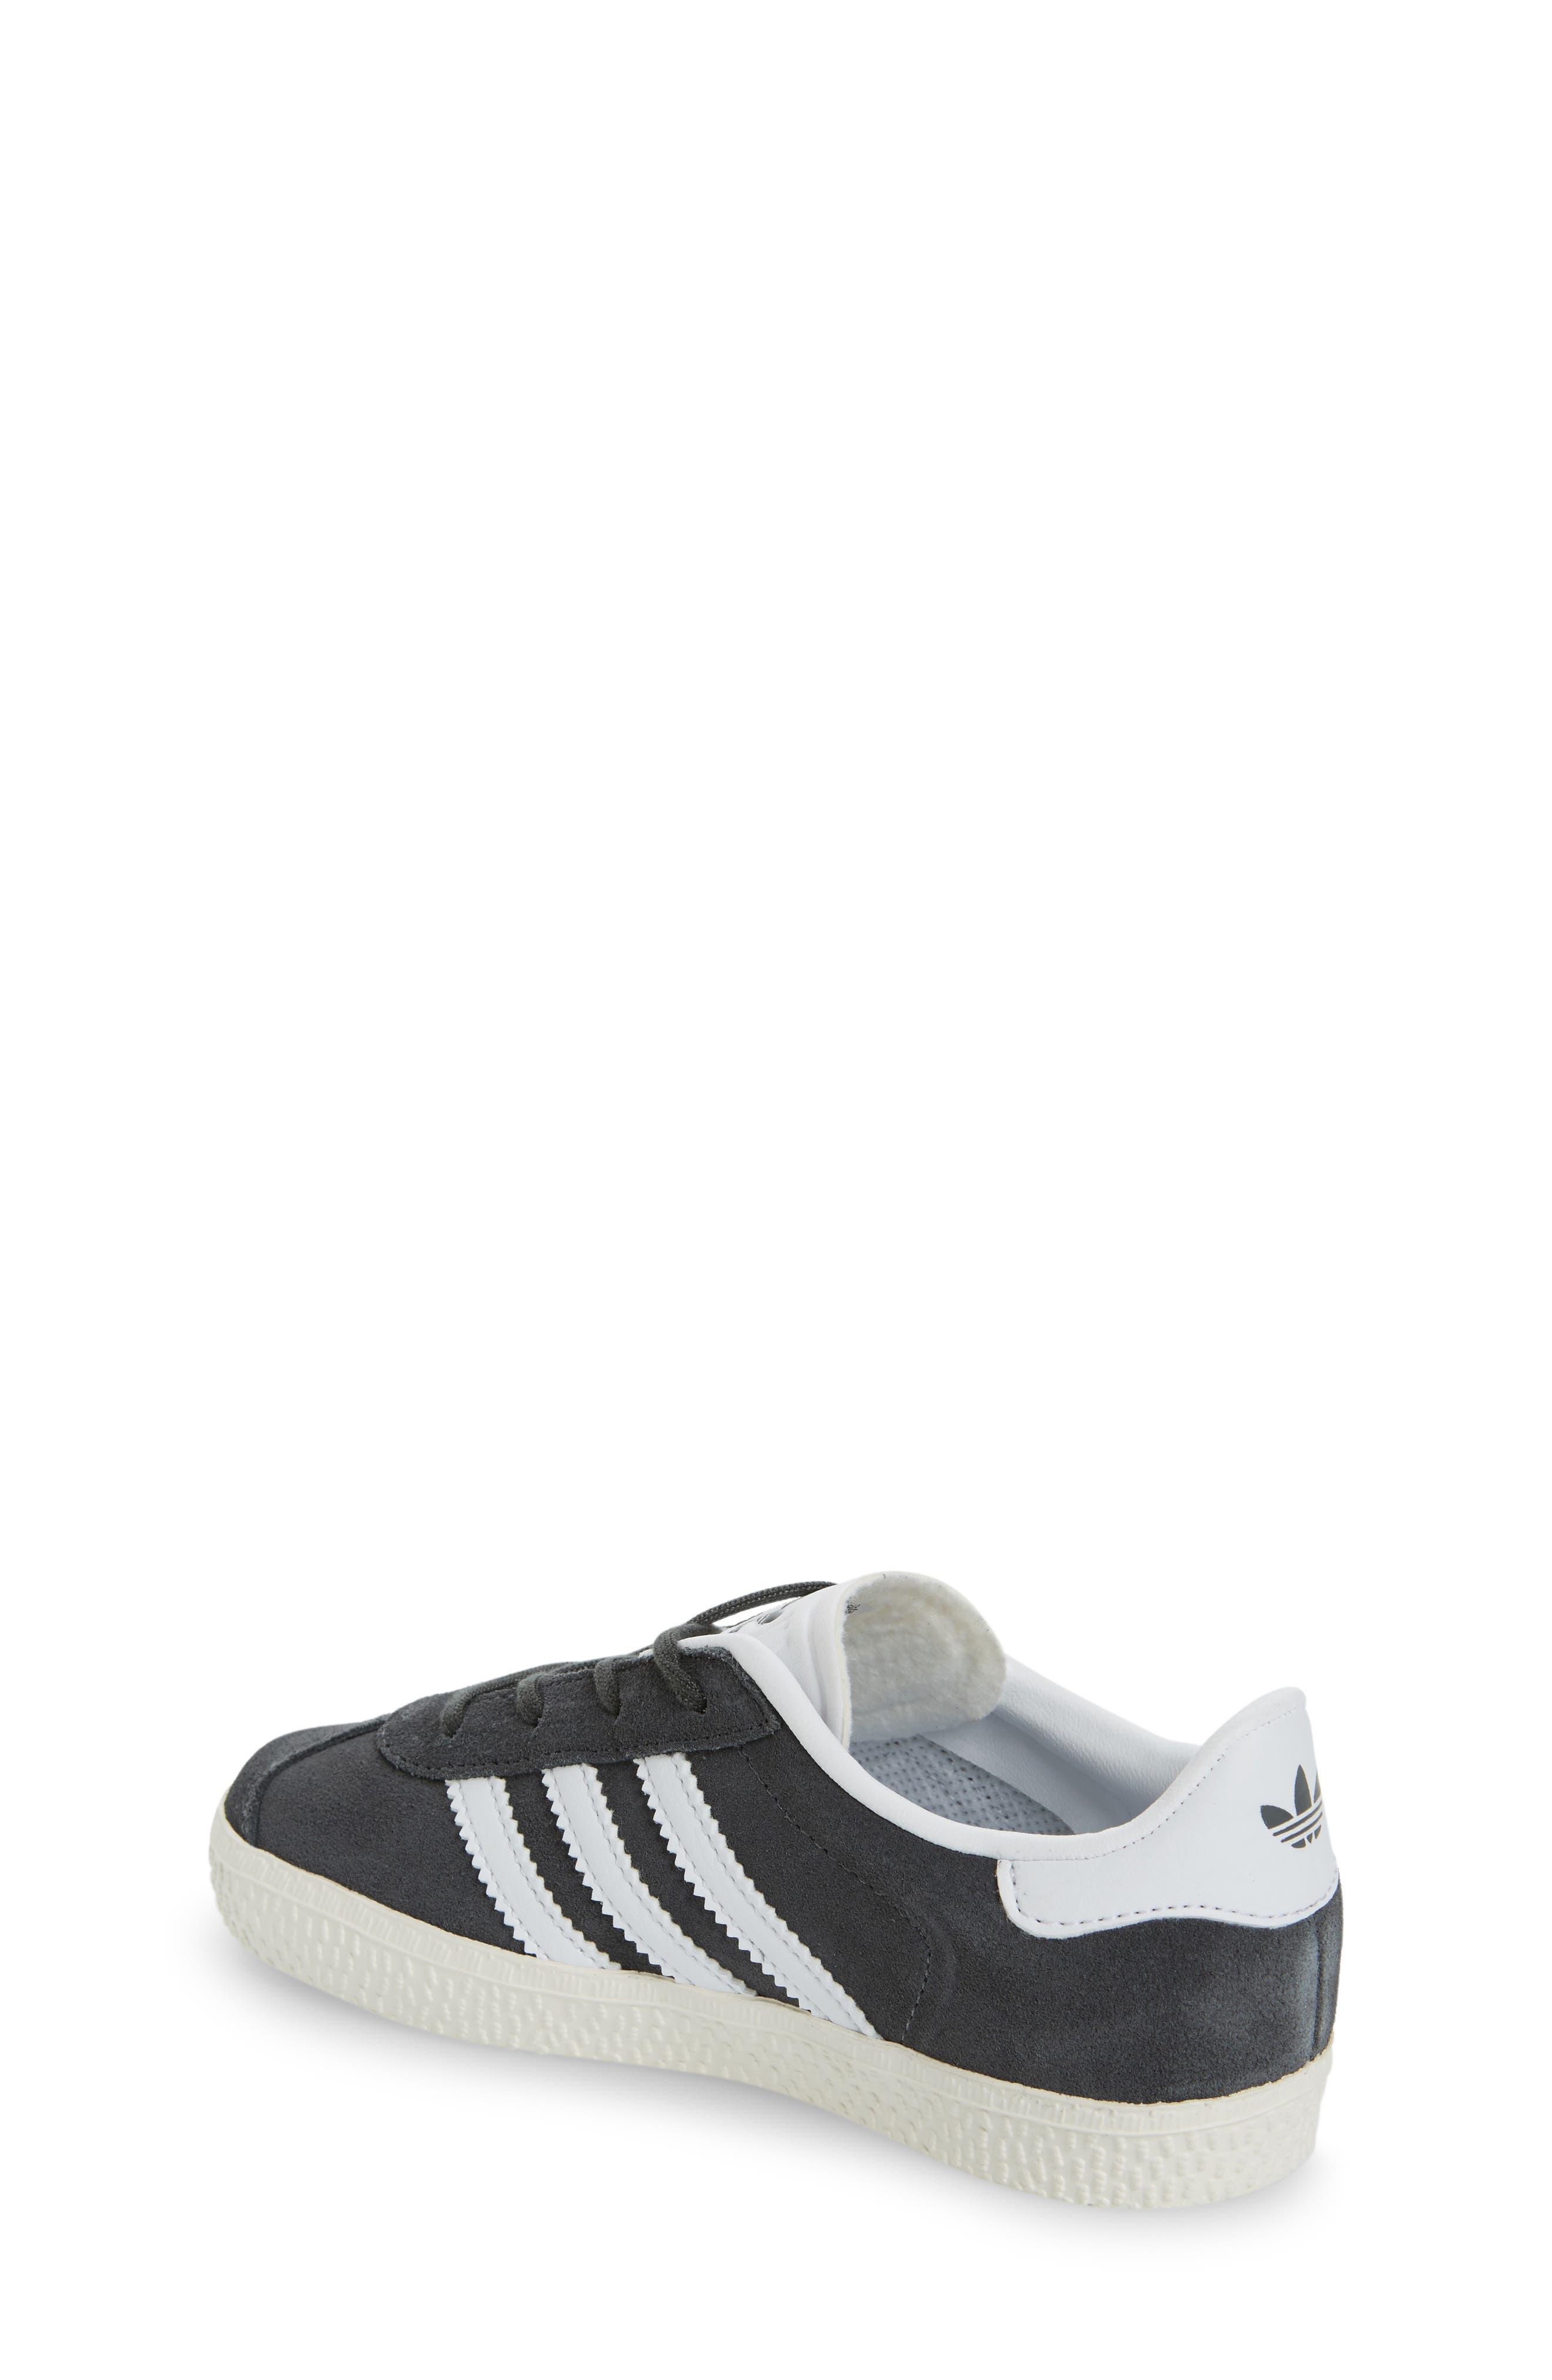 Alternate Image 2  - adidas Gazelle Sneaker (Baby, Walker & Toddler)